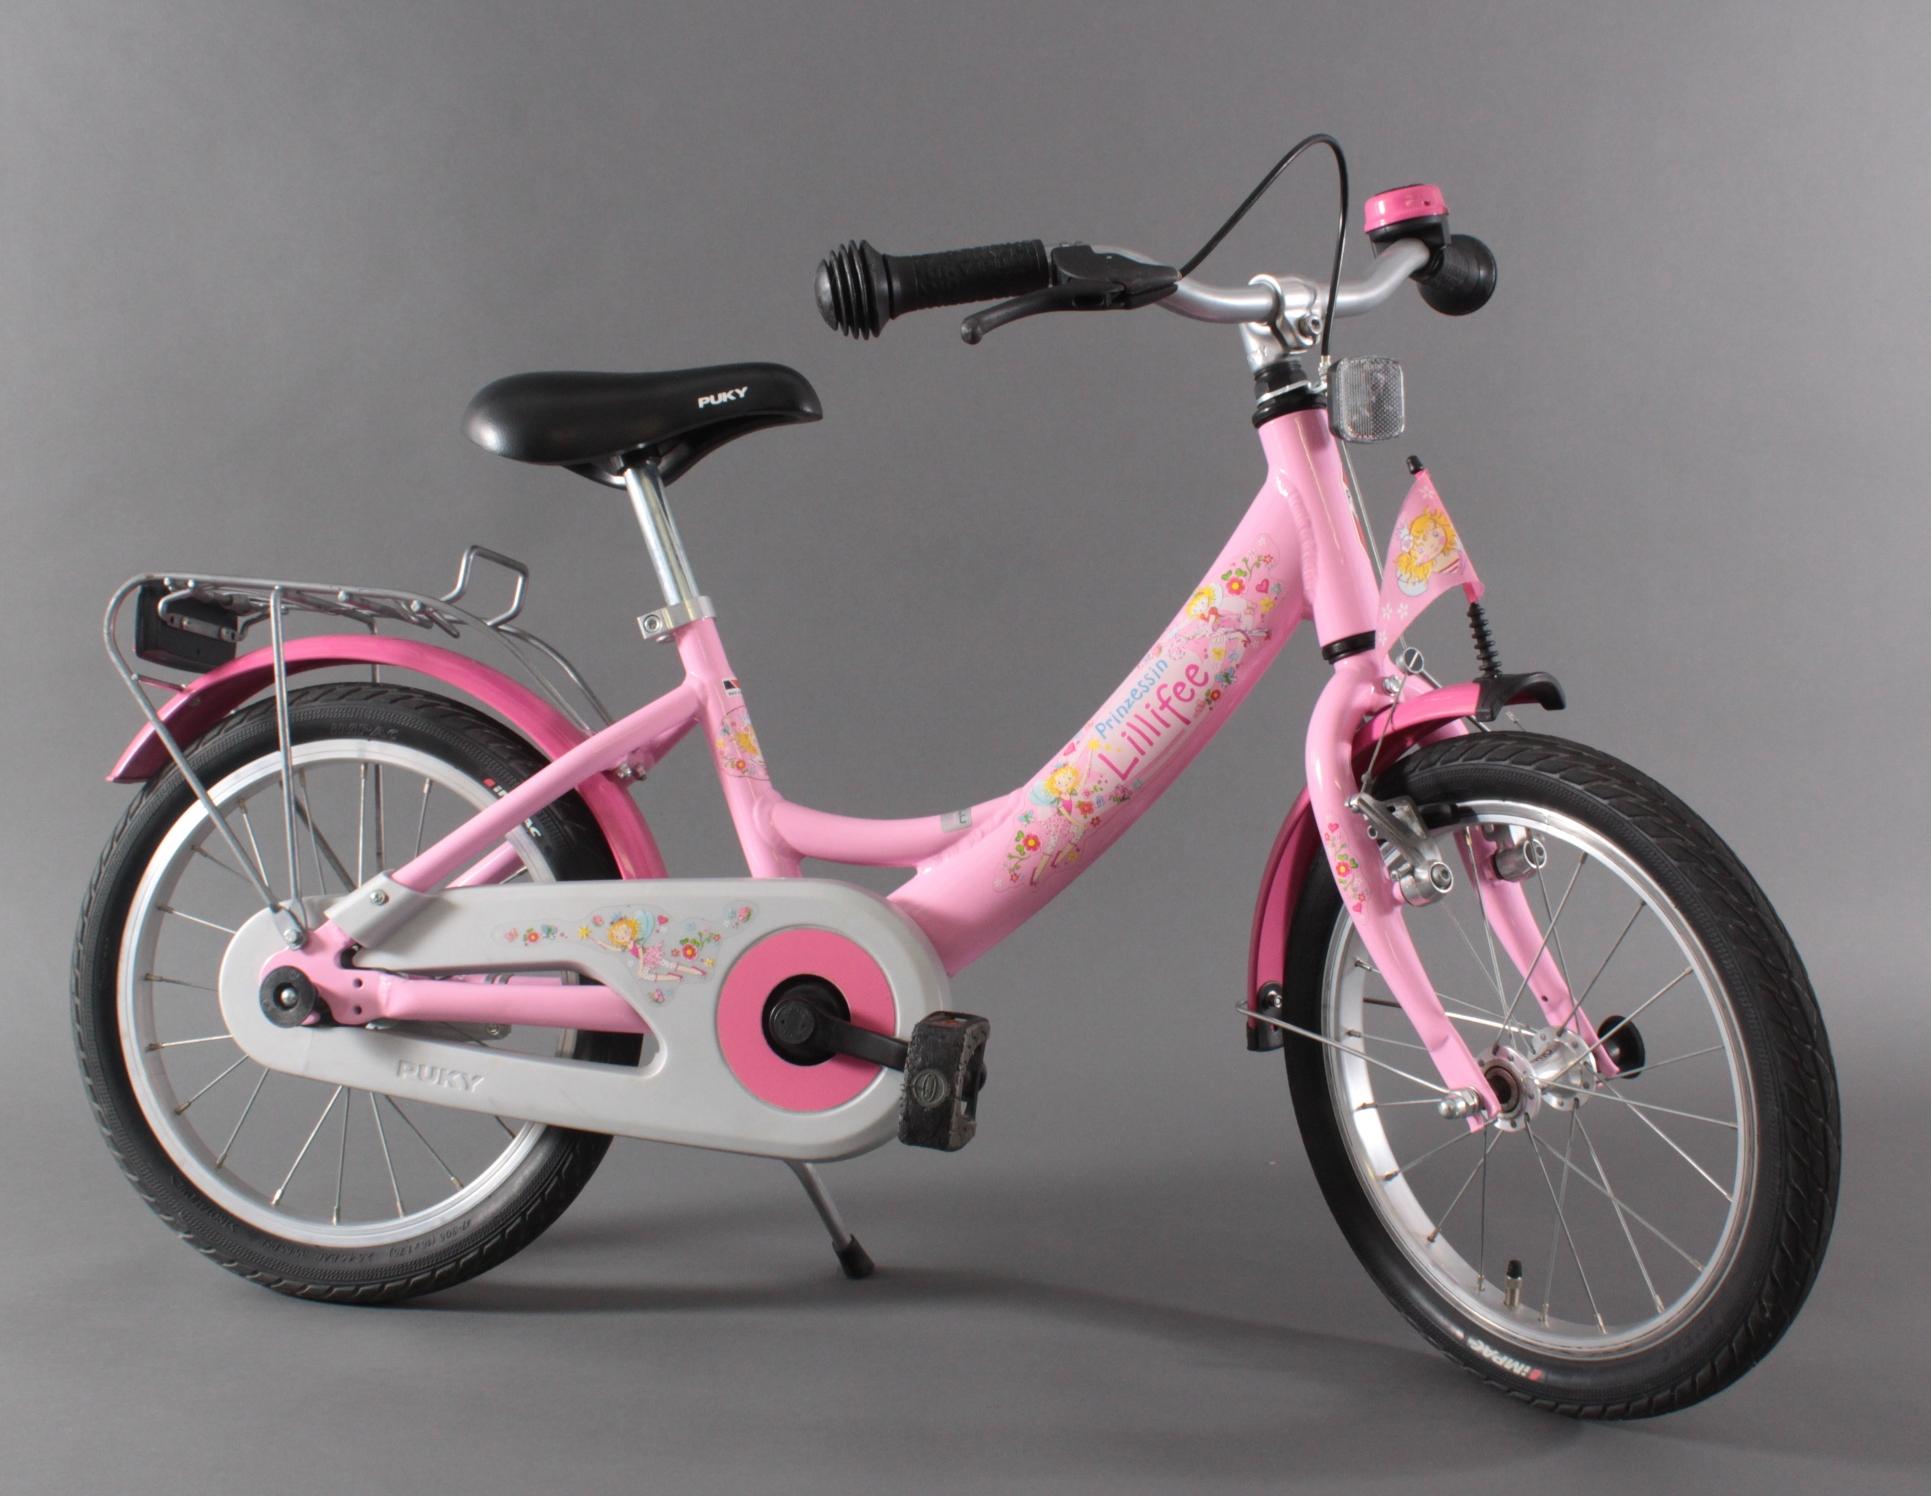 Prinzessin Lillifee Kinder-Fahrrad von Puky